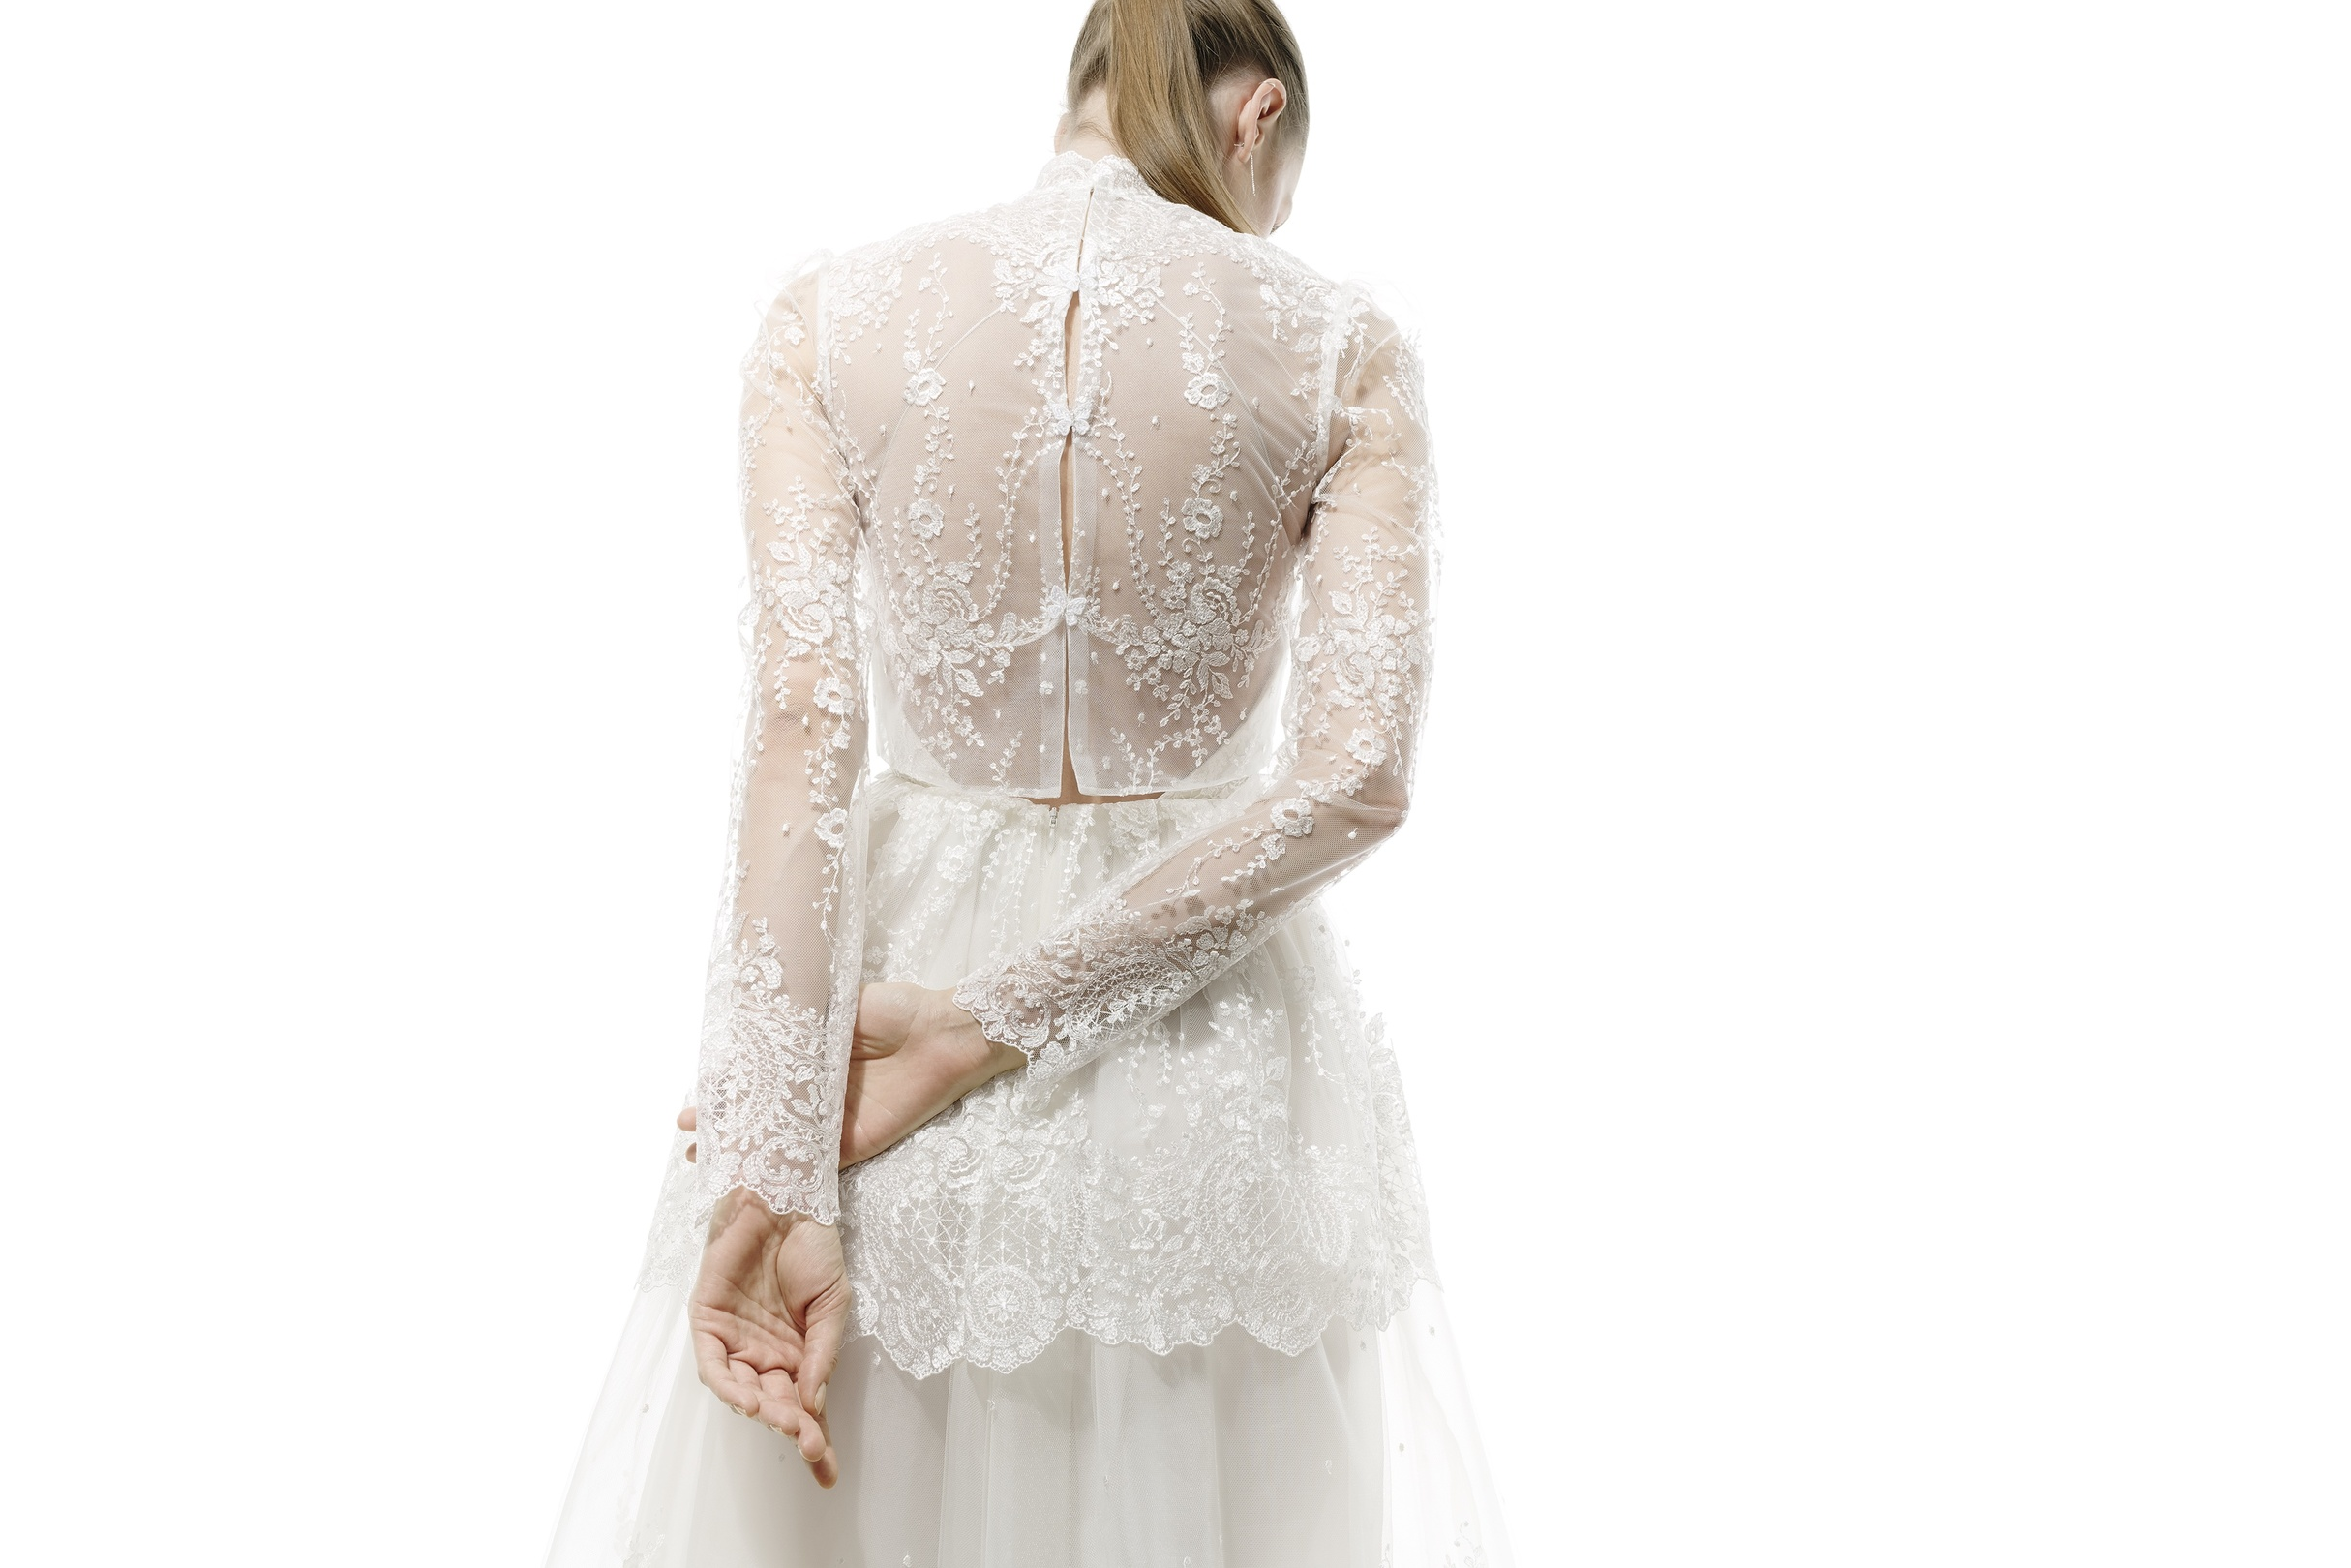 ines top dress photo